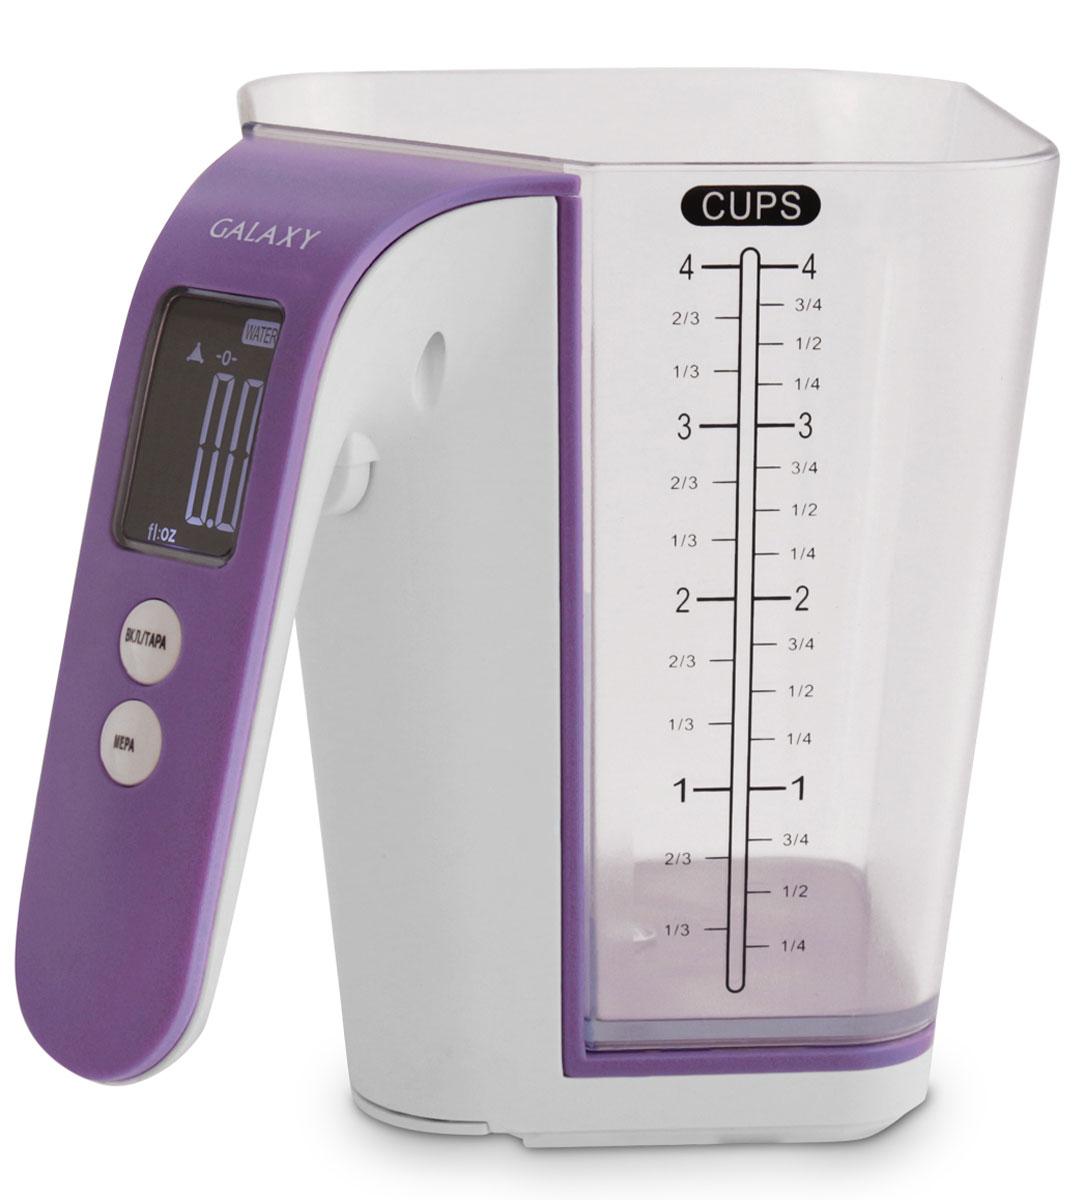 Galaxy GL 2805 кухонные весы